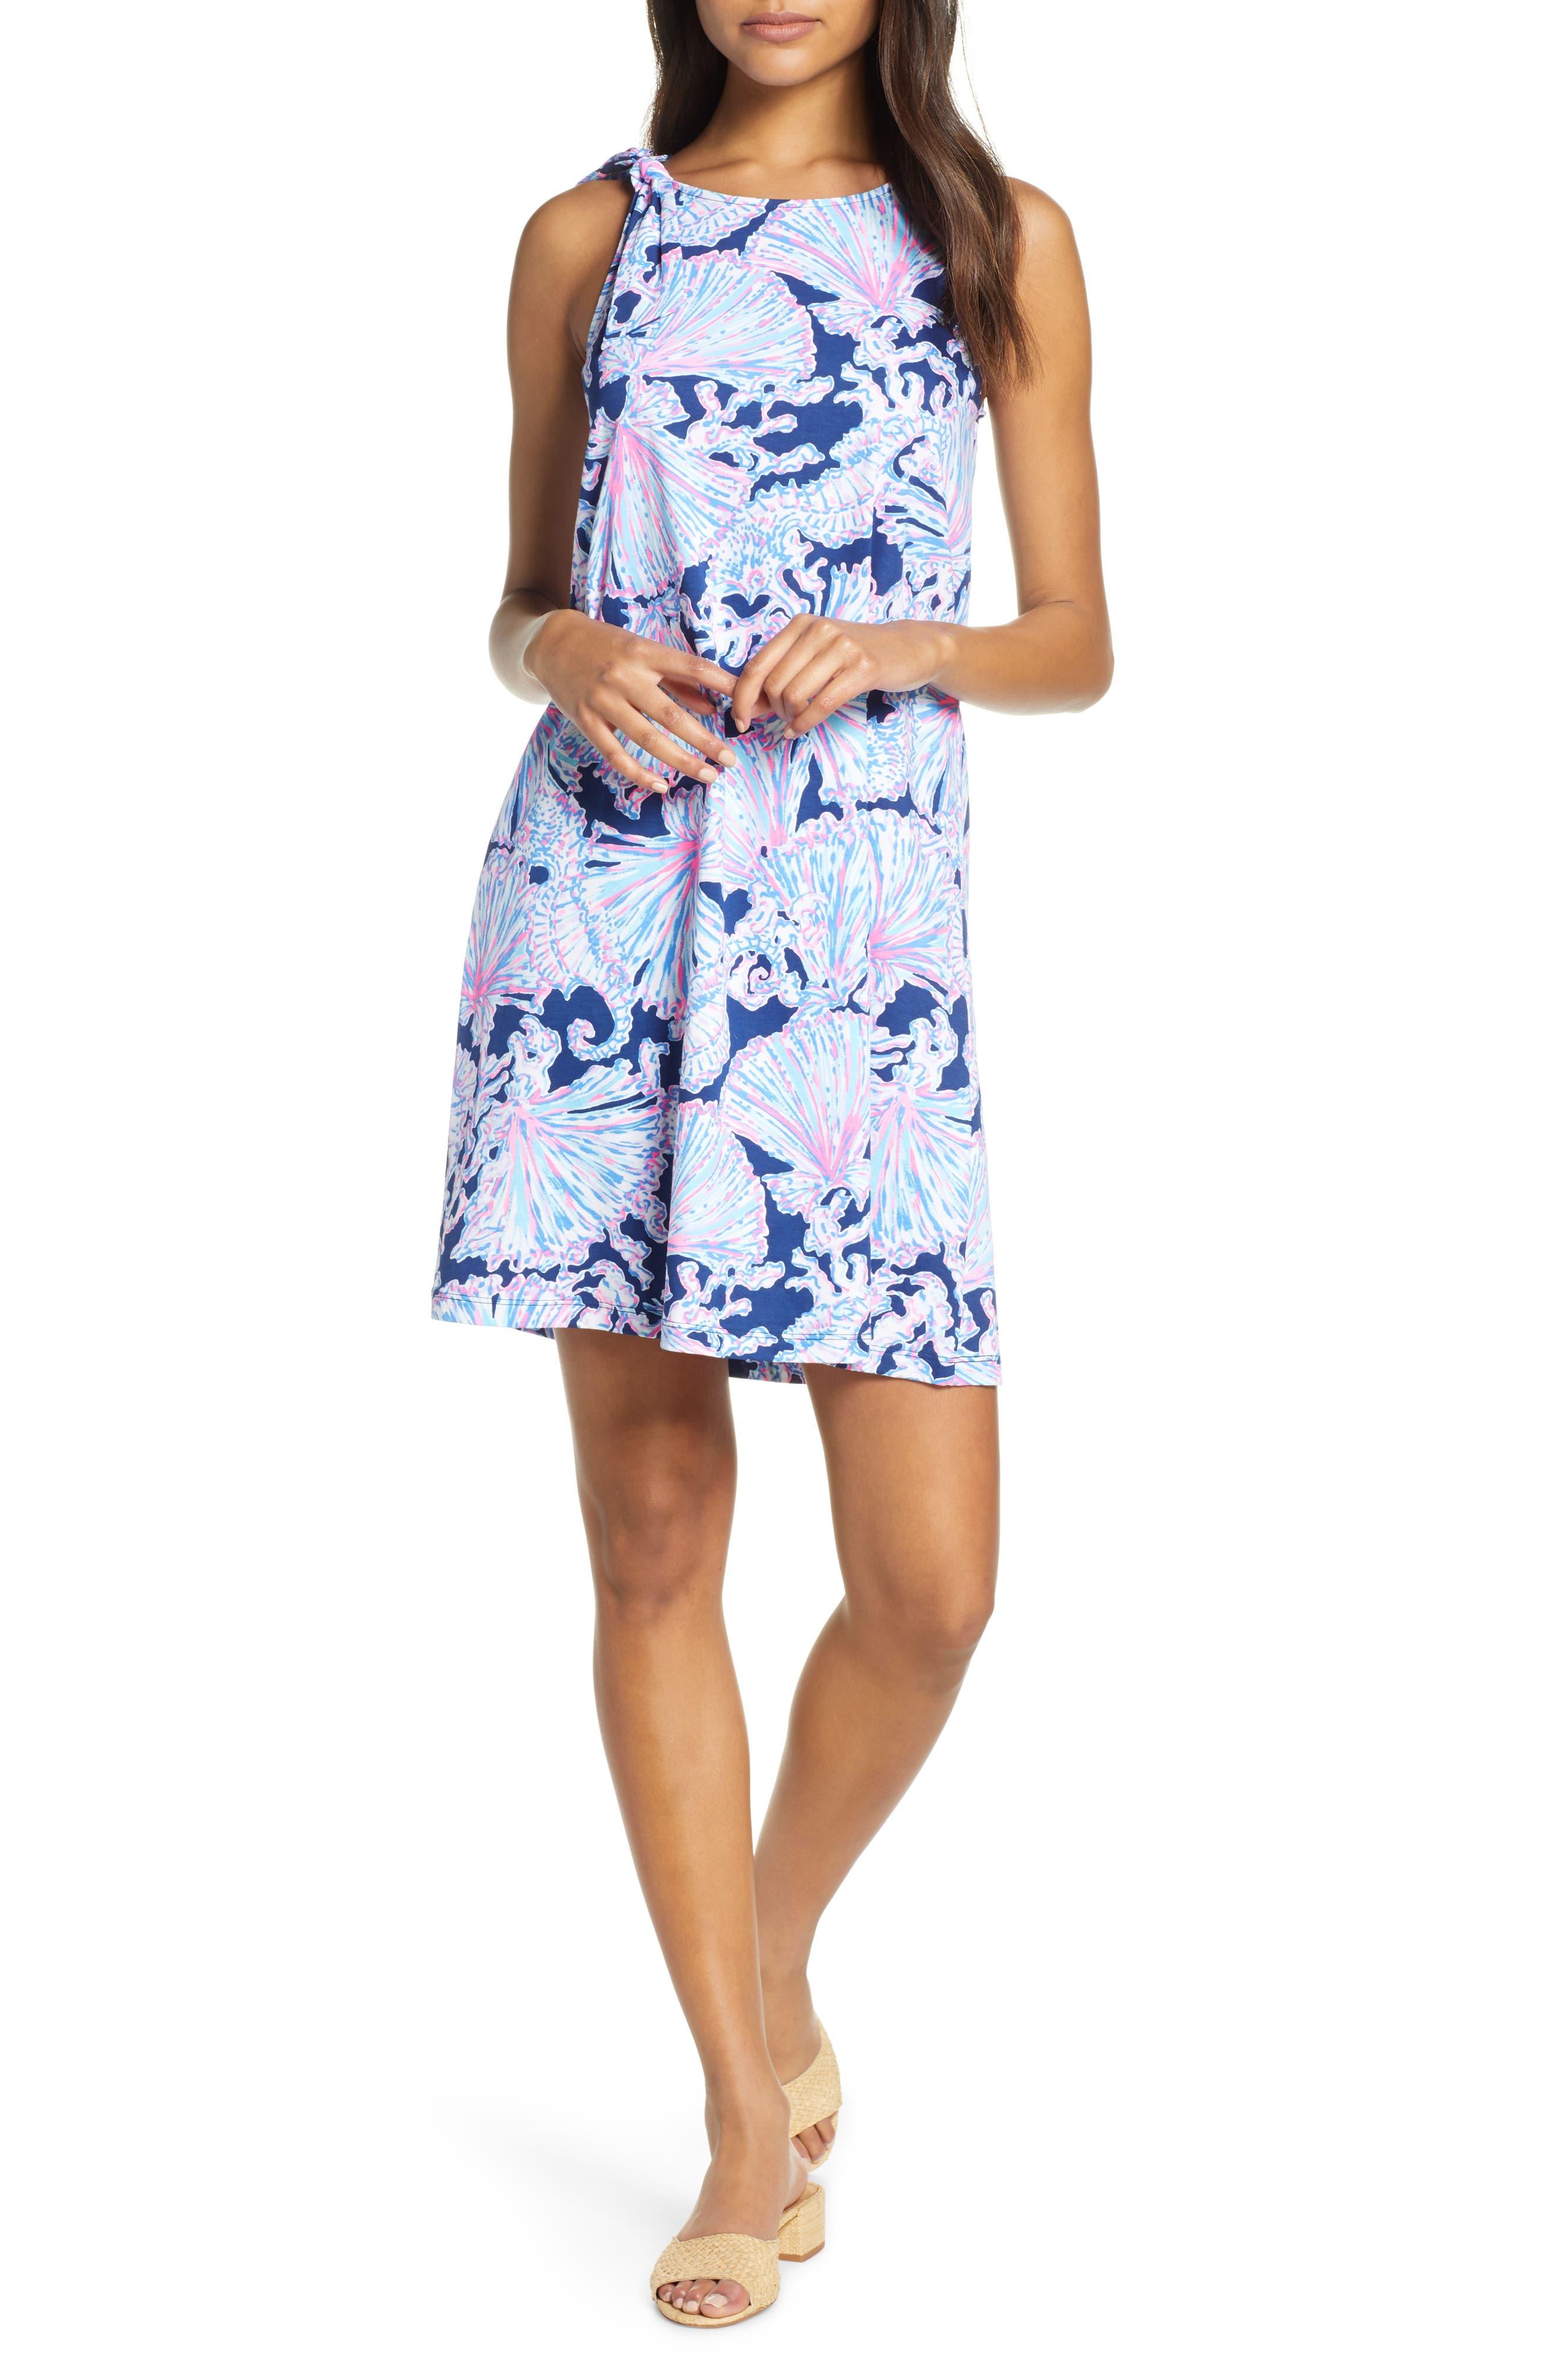 Lilly Pulitzer Luella Sleeveless Shift Dress, Blue